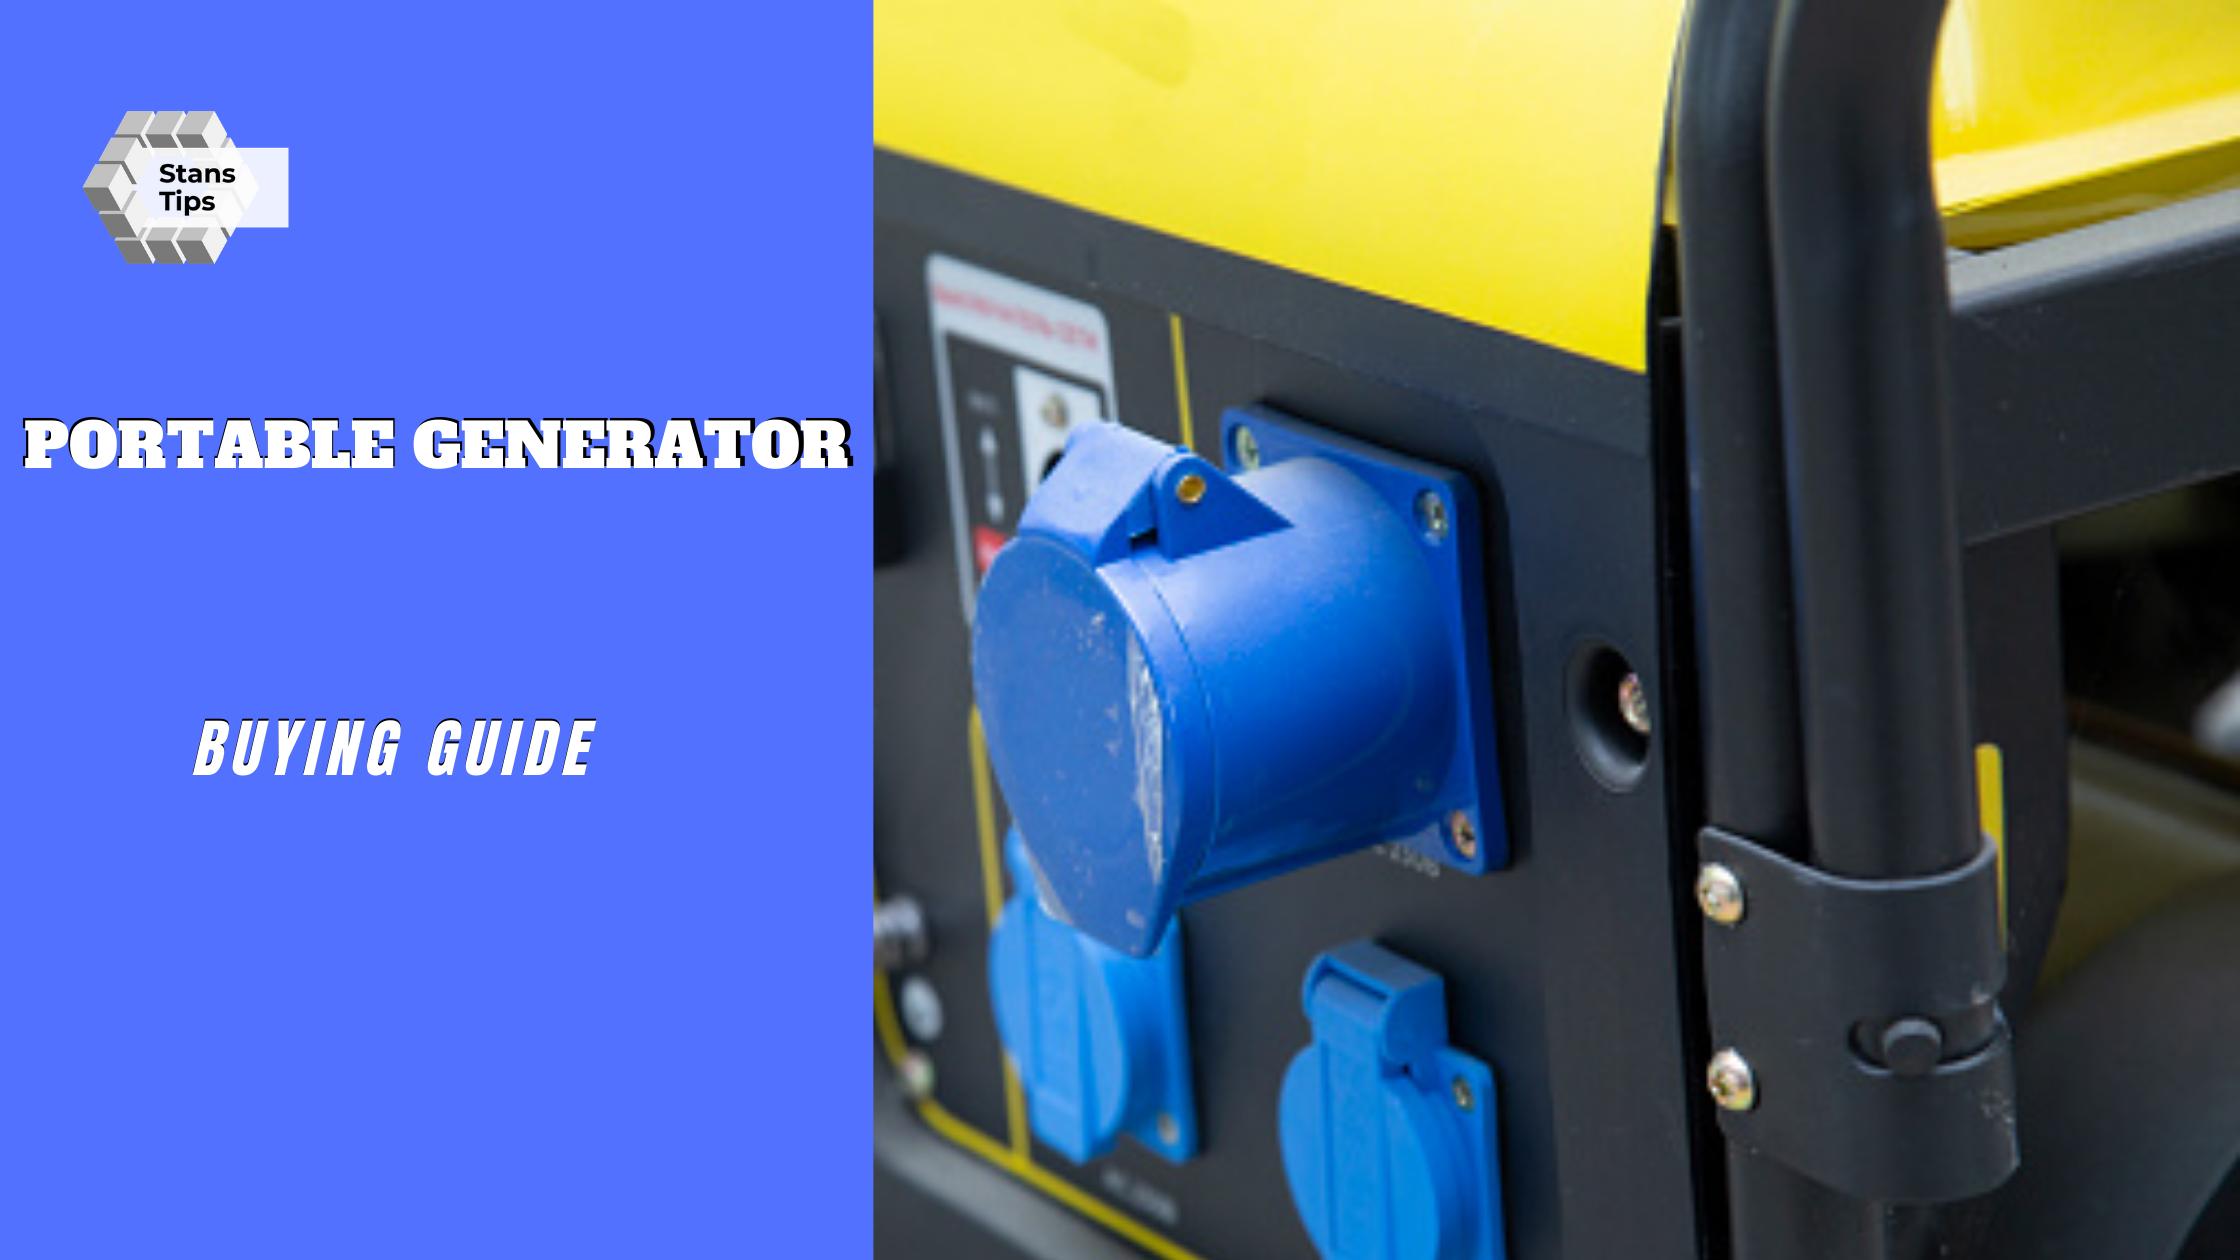 Portable generator buying guides